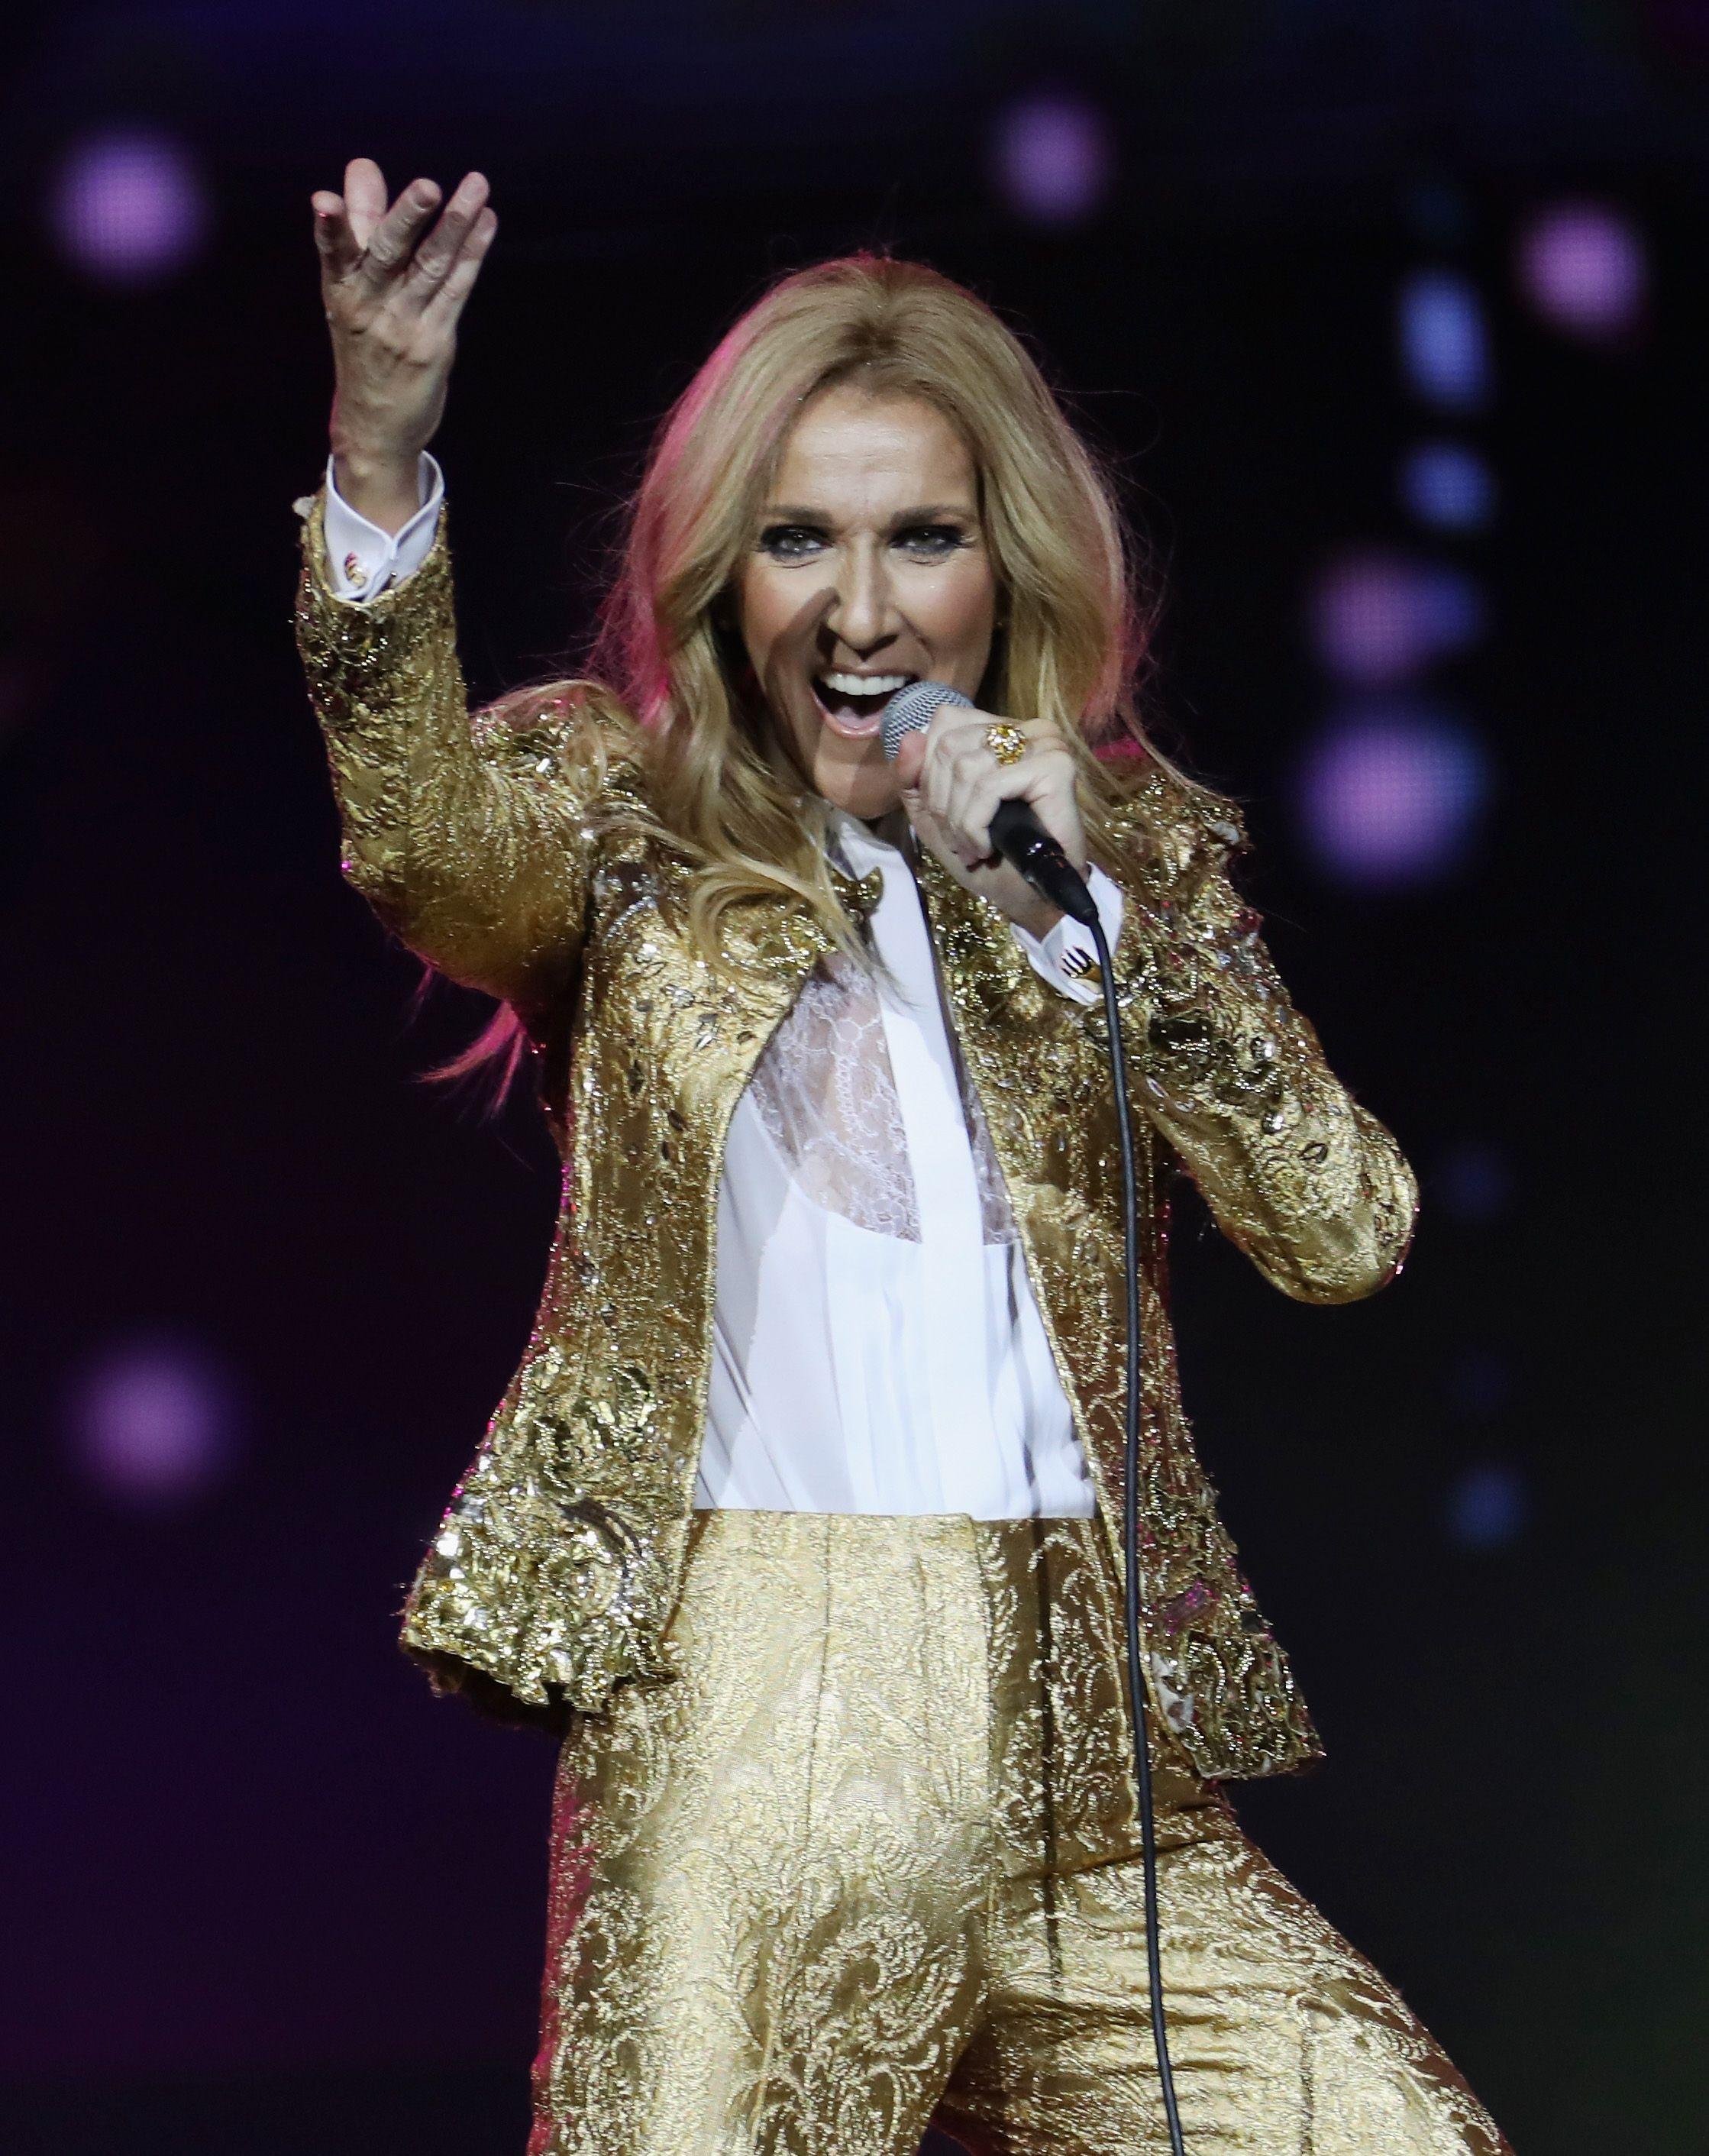 Celine Dion Performs In Sydney